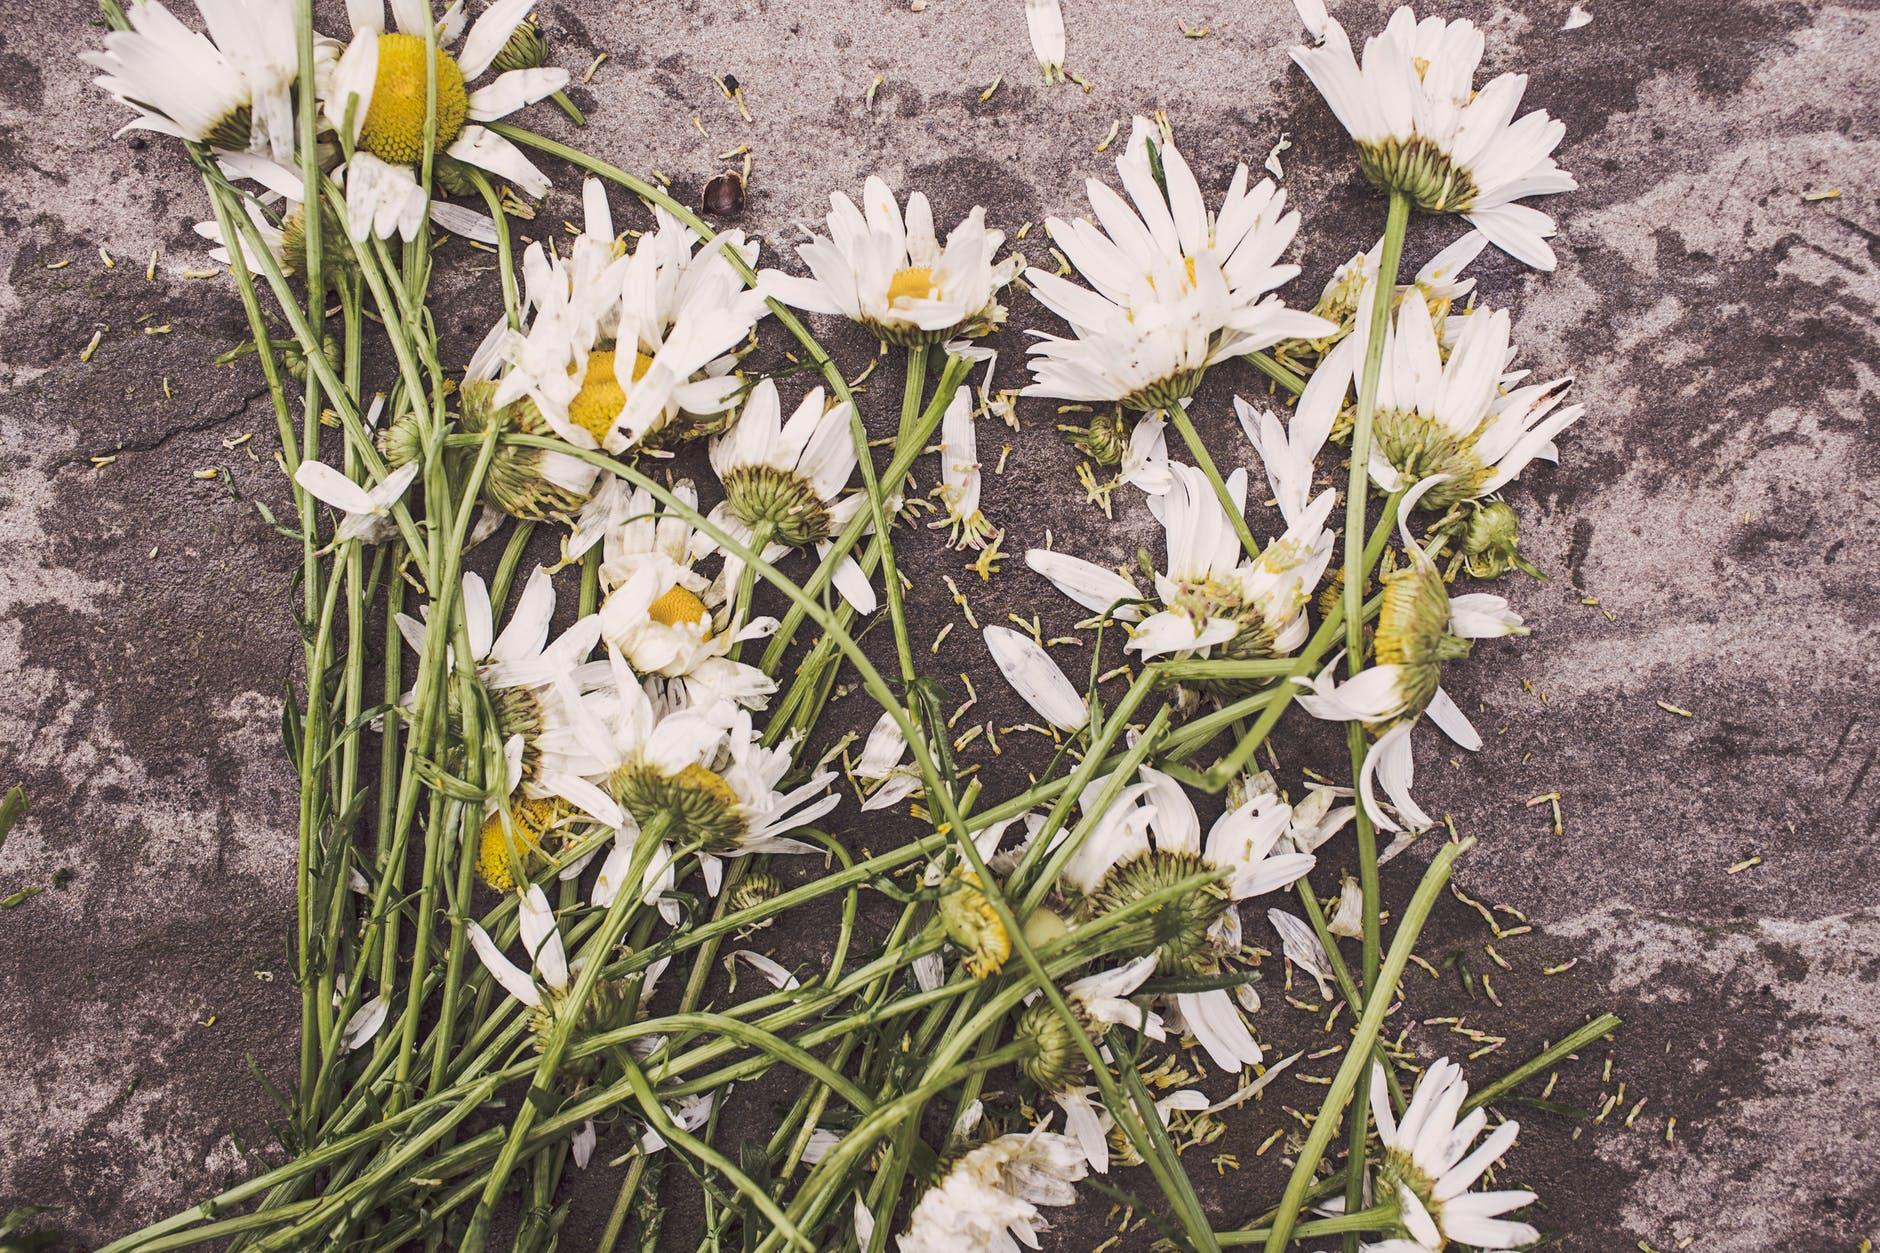 flowers marguerites destroyed dead